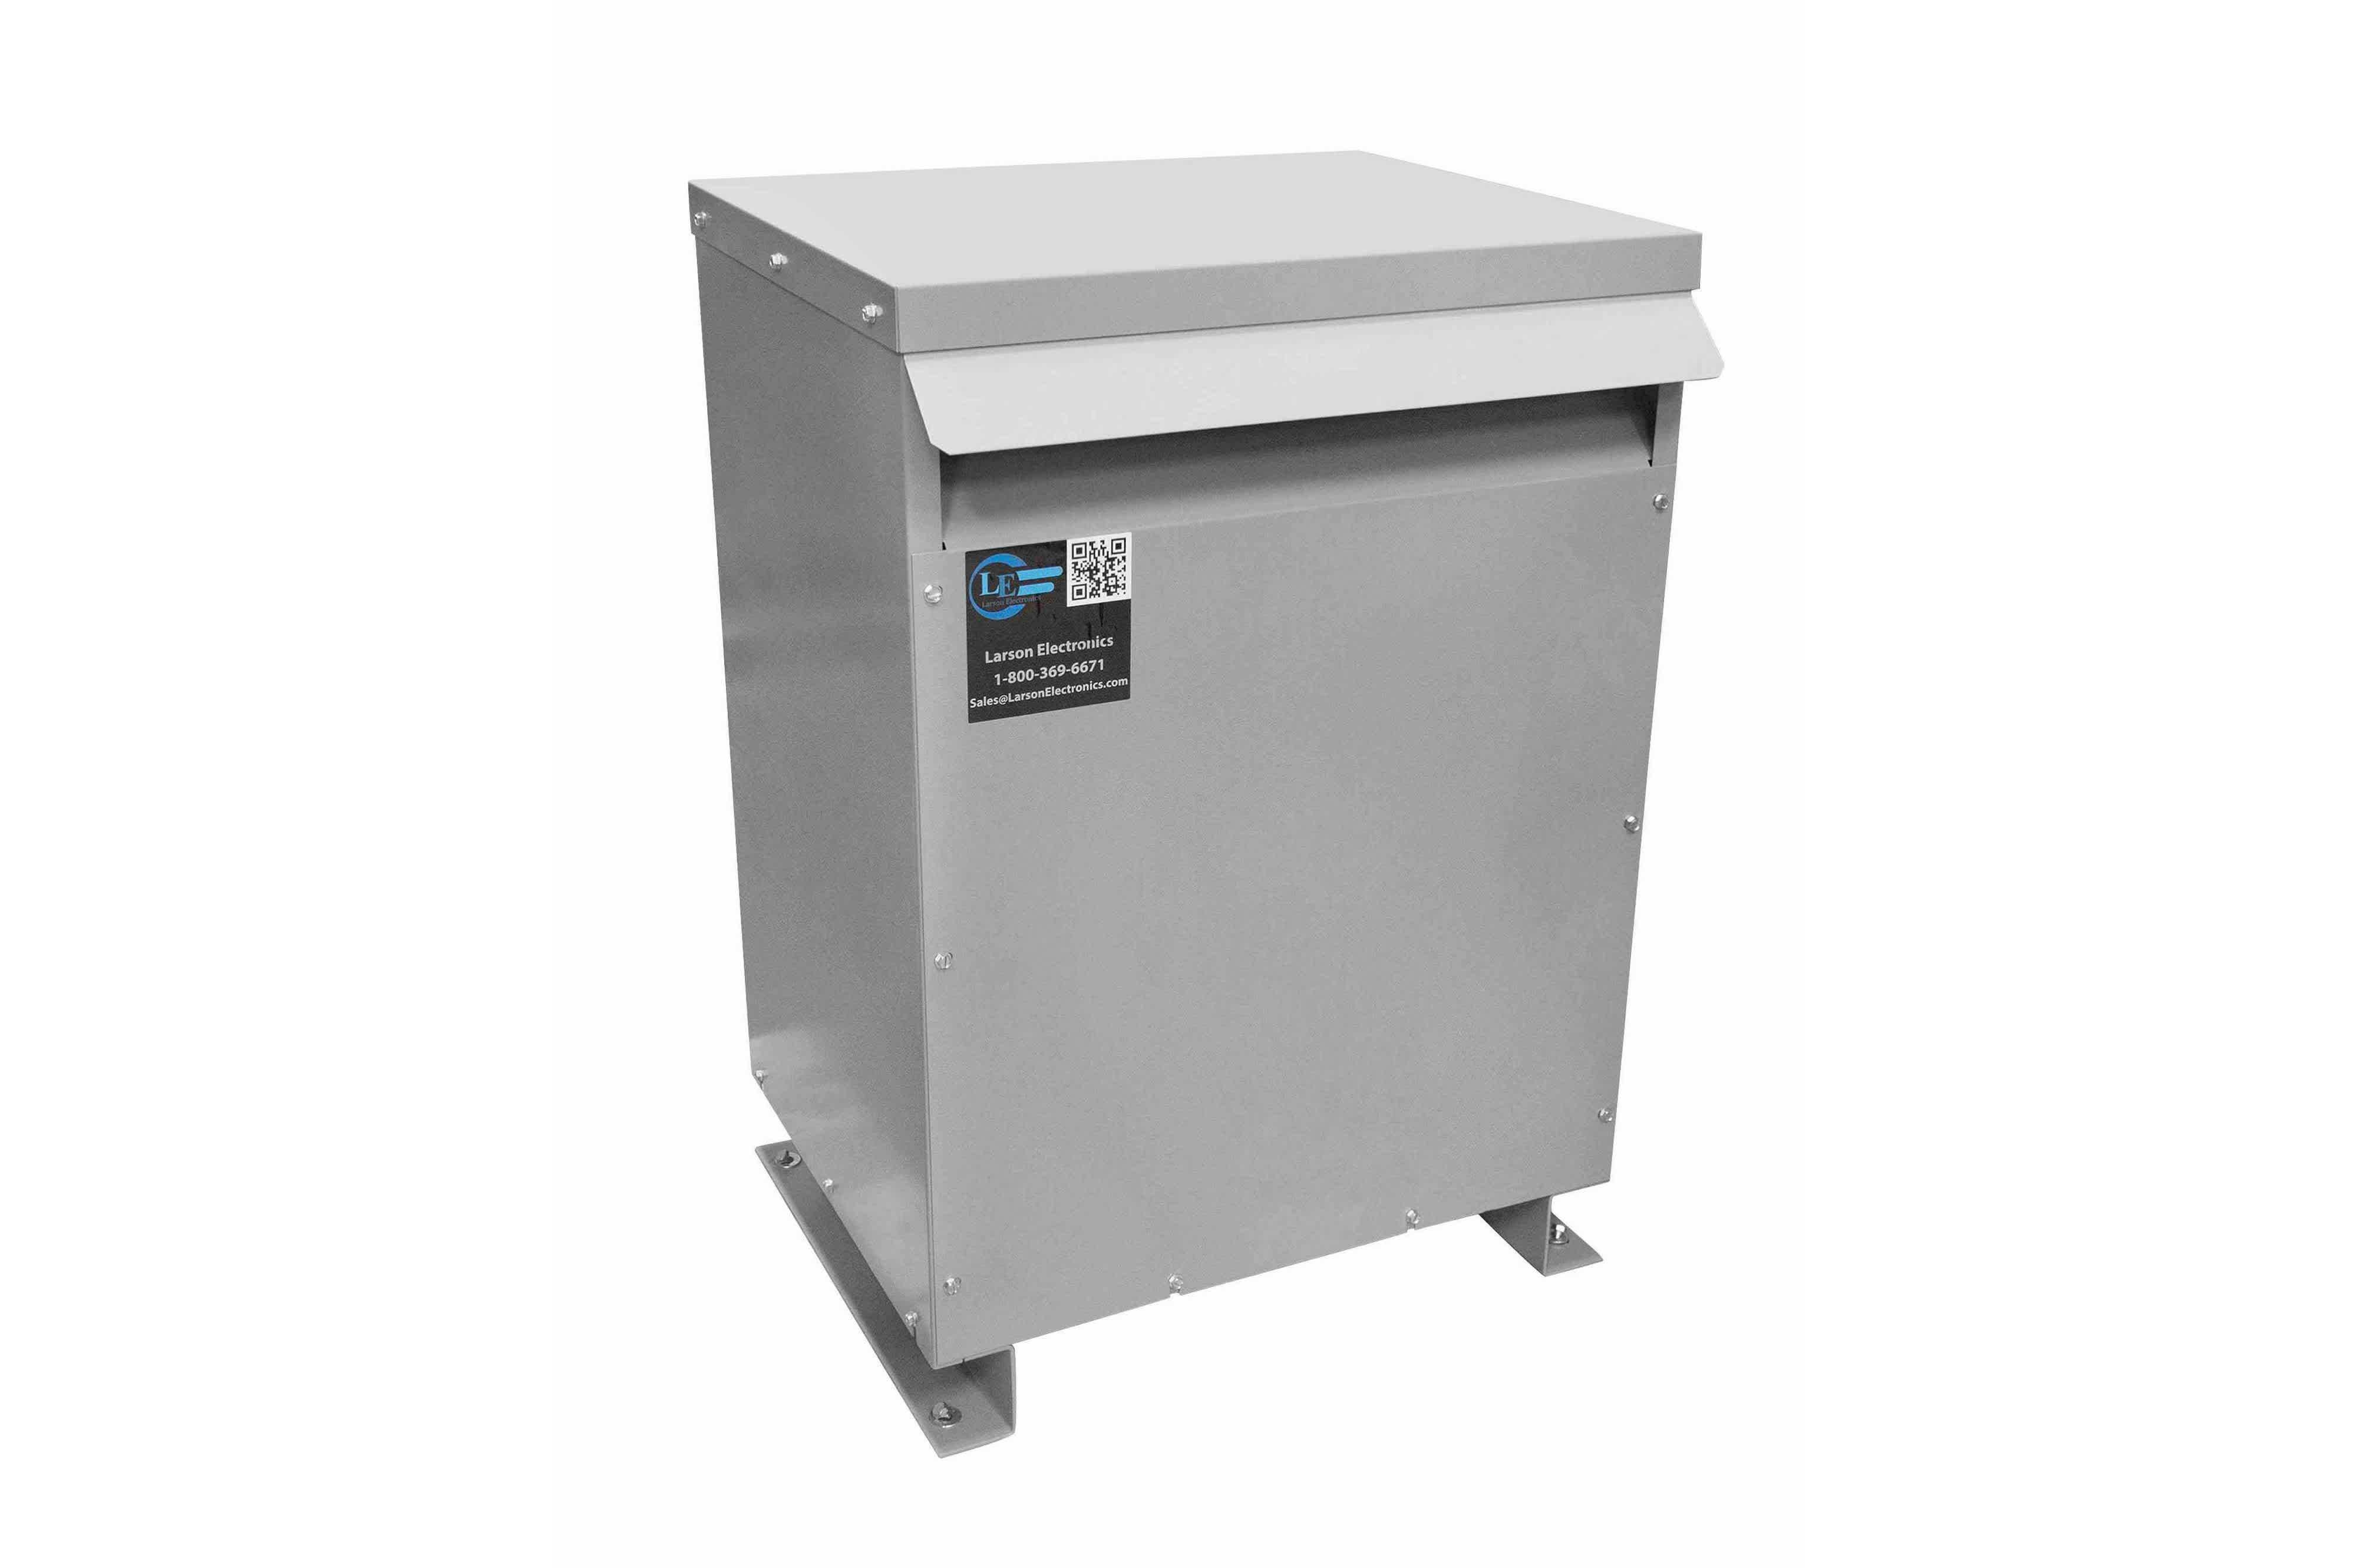 125 kVA 3PH Isolation Transformer, 480V Wye Primary, 240V Delta Secondary, N3R, Ventilated, 60 Hz